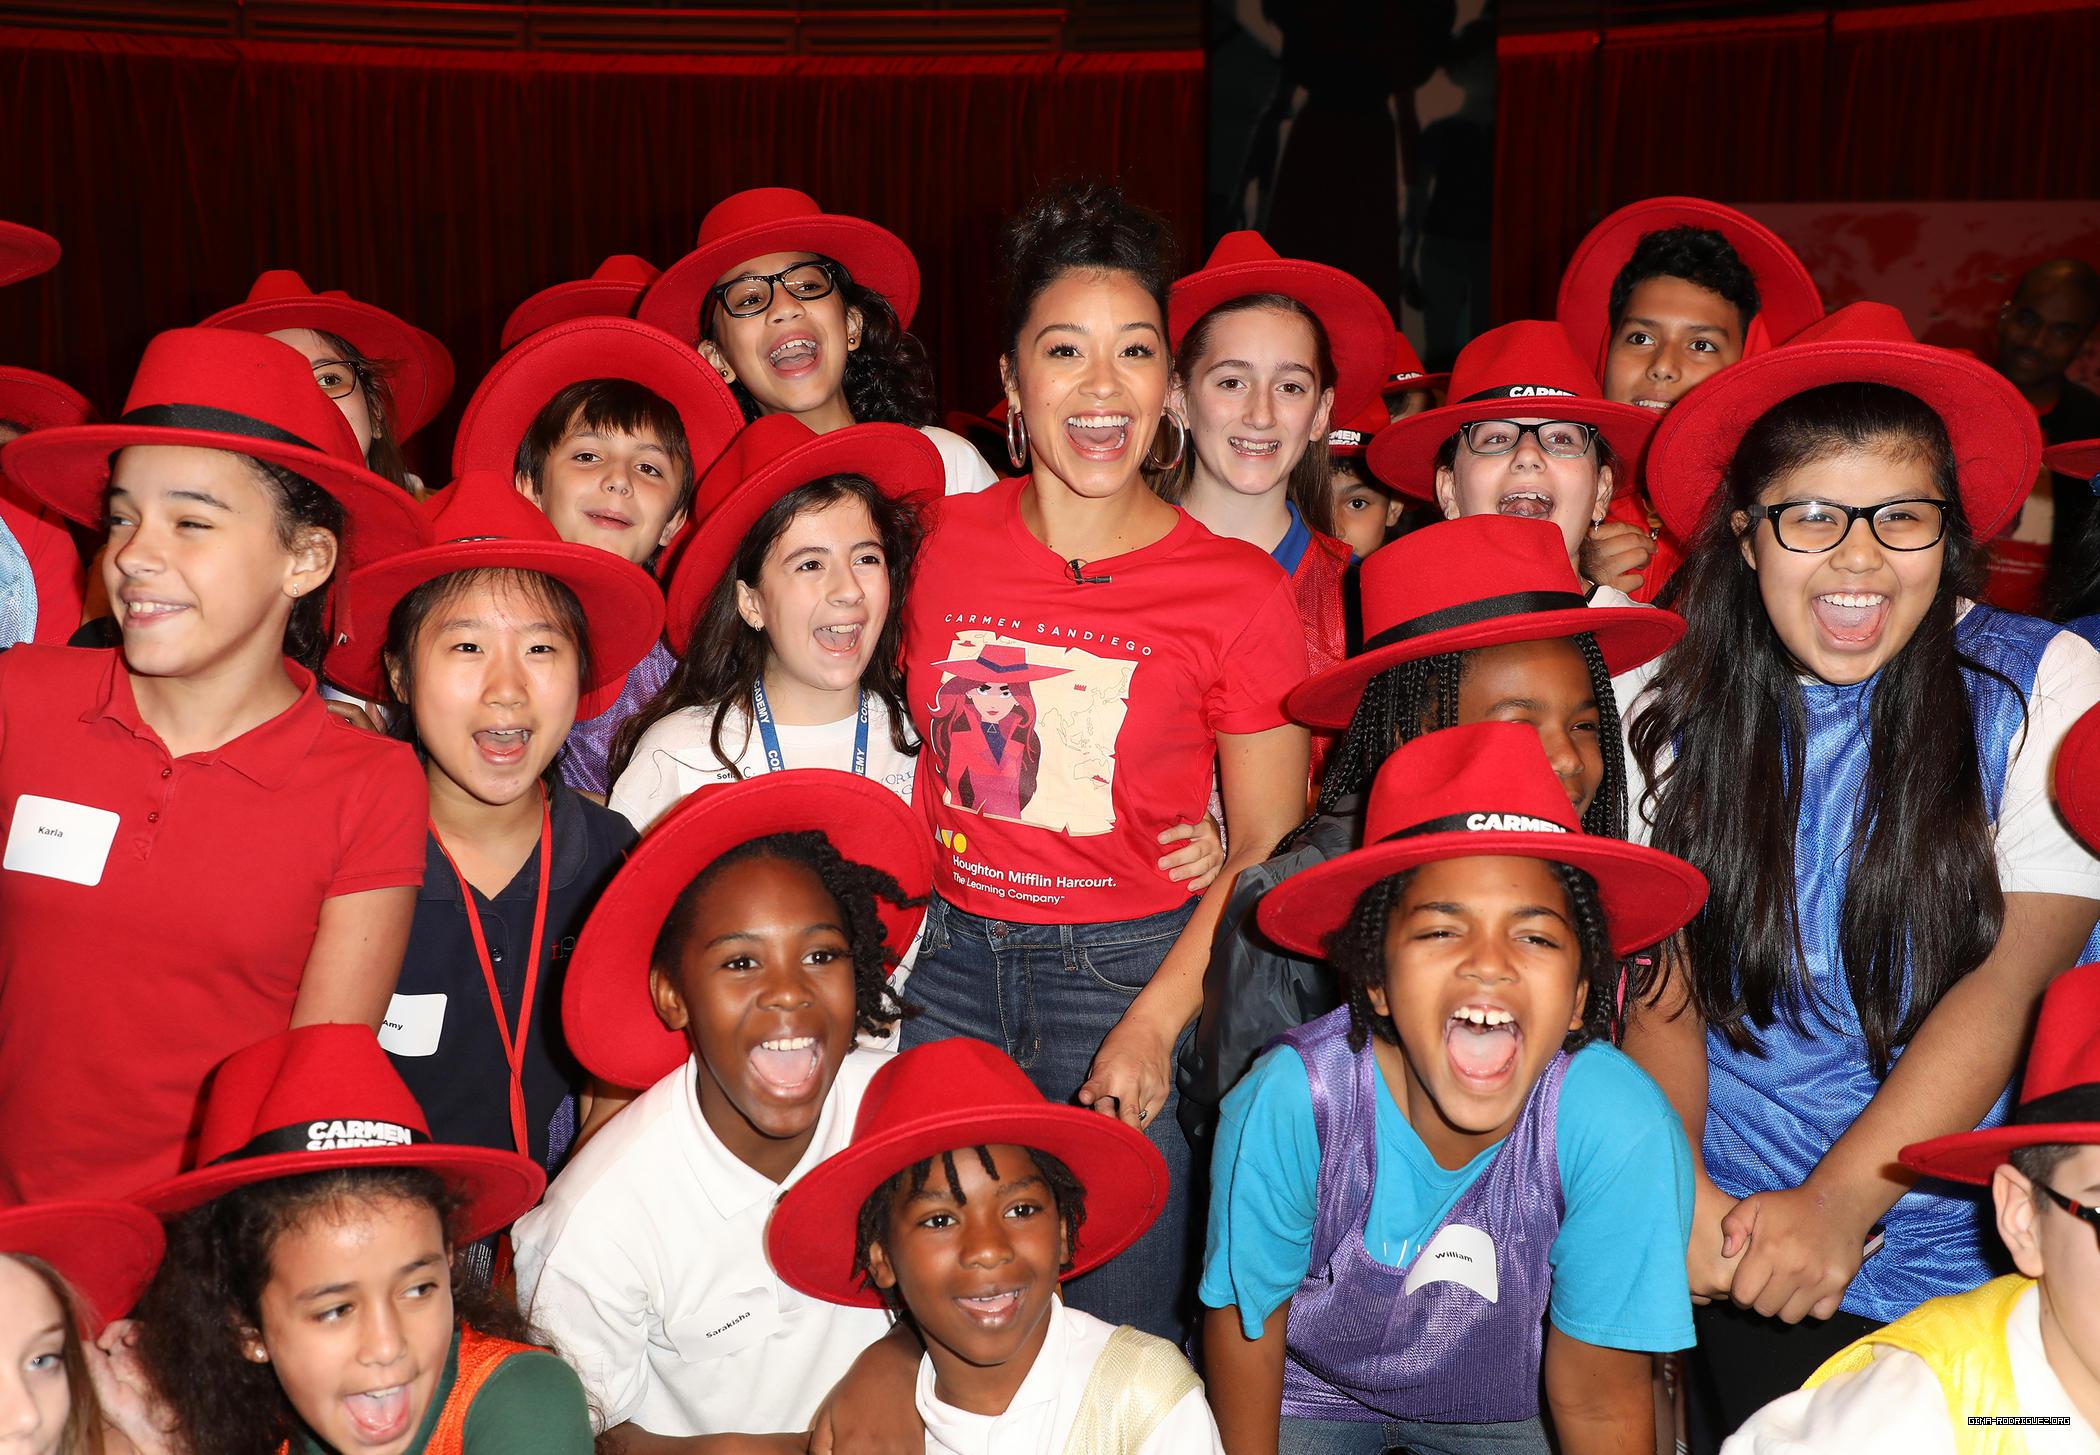 Photos: Hosting Carmen Sandiego Day in Miami